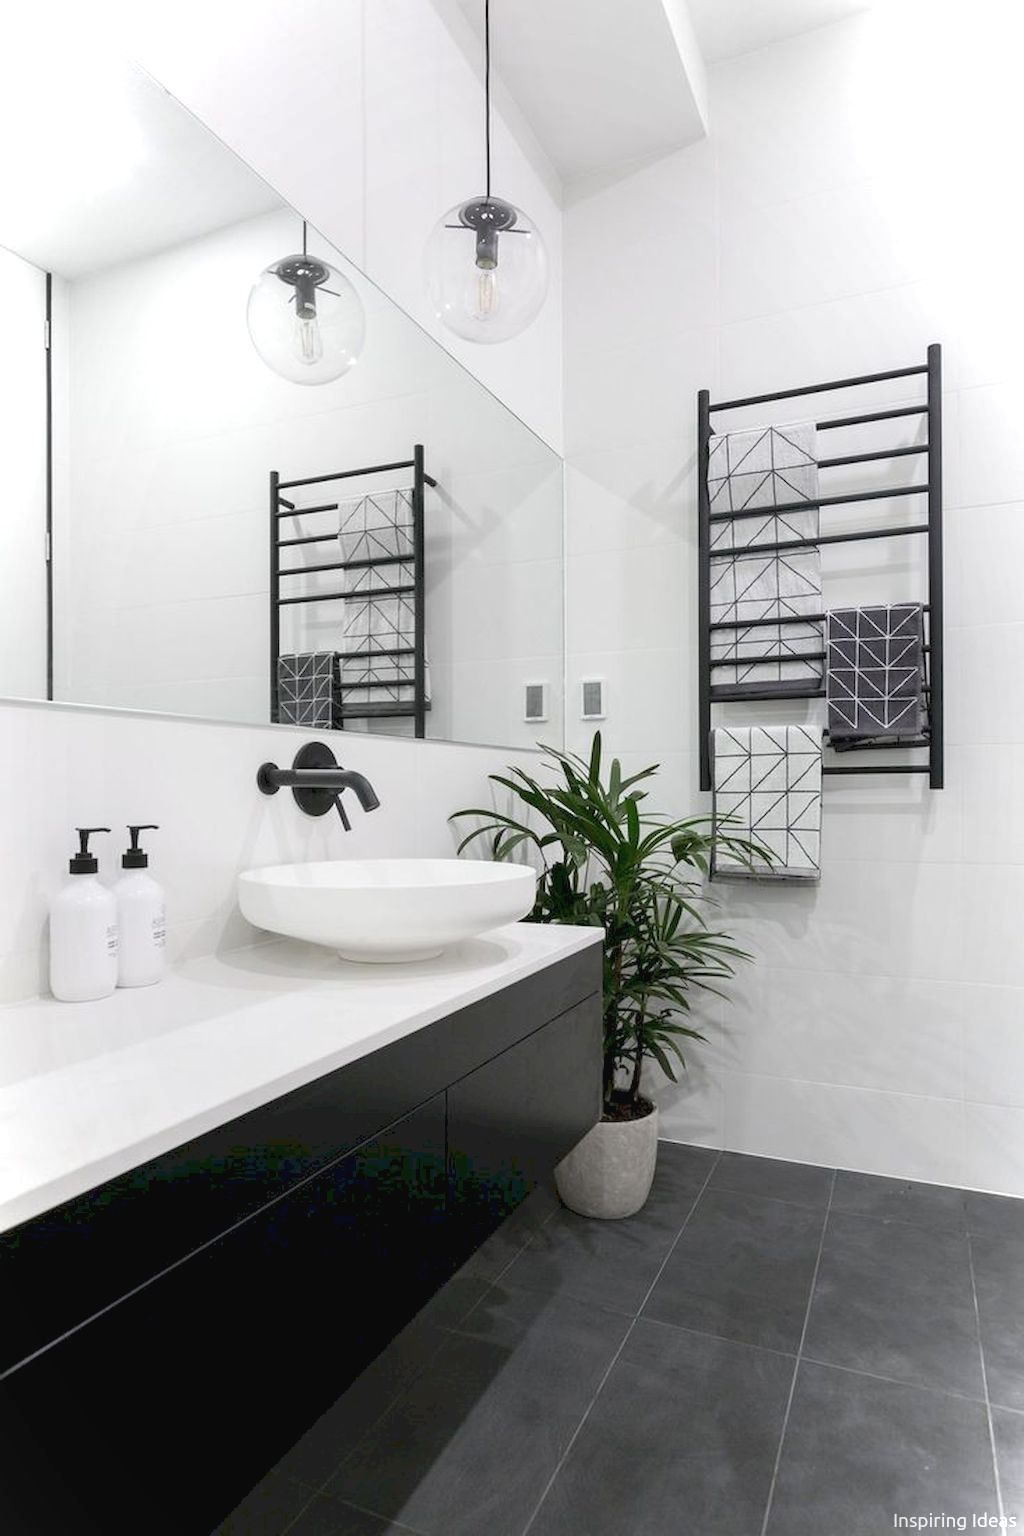 Brighton by canny myhouseidea batcave in bathroom minimalist interior also rh pinterest